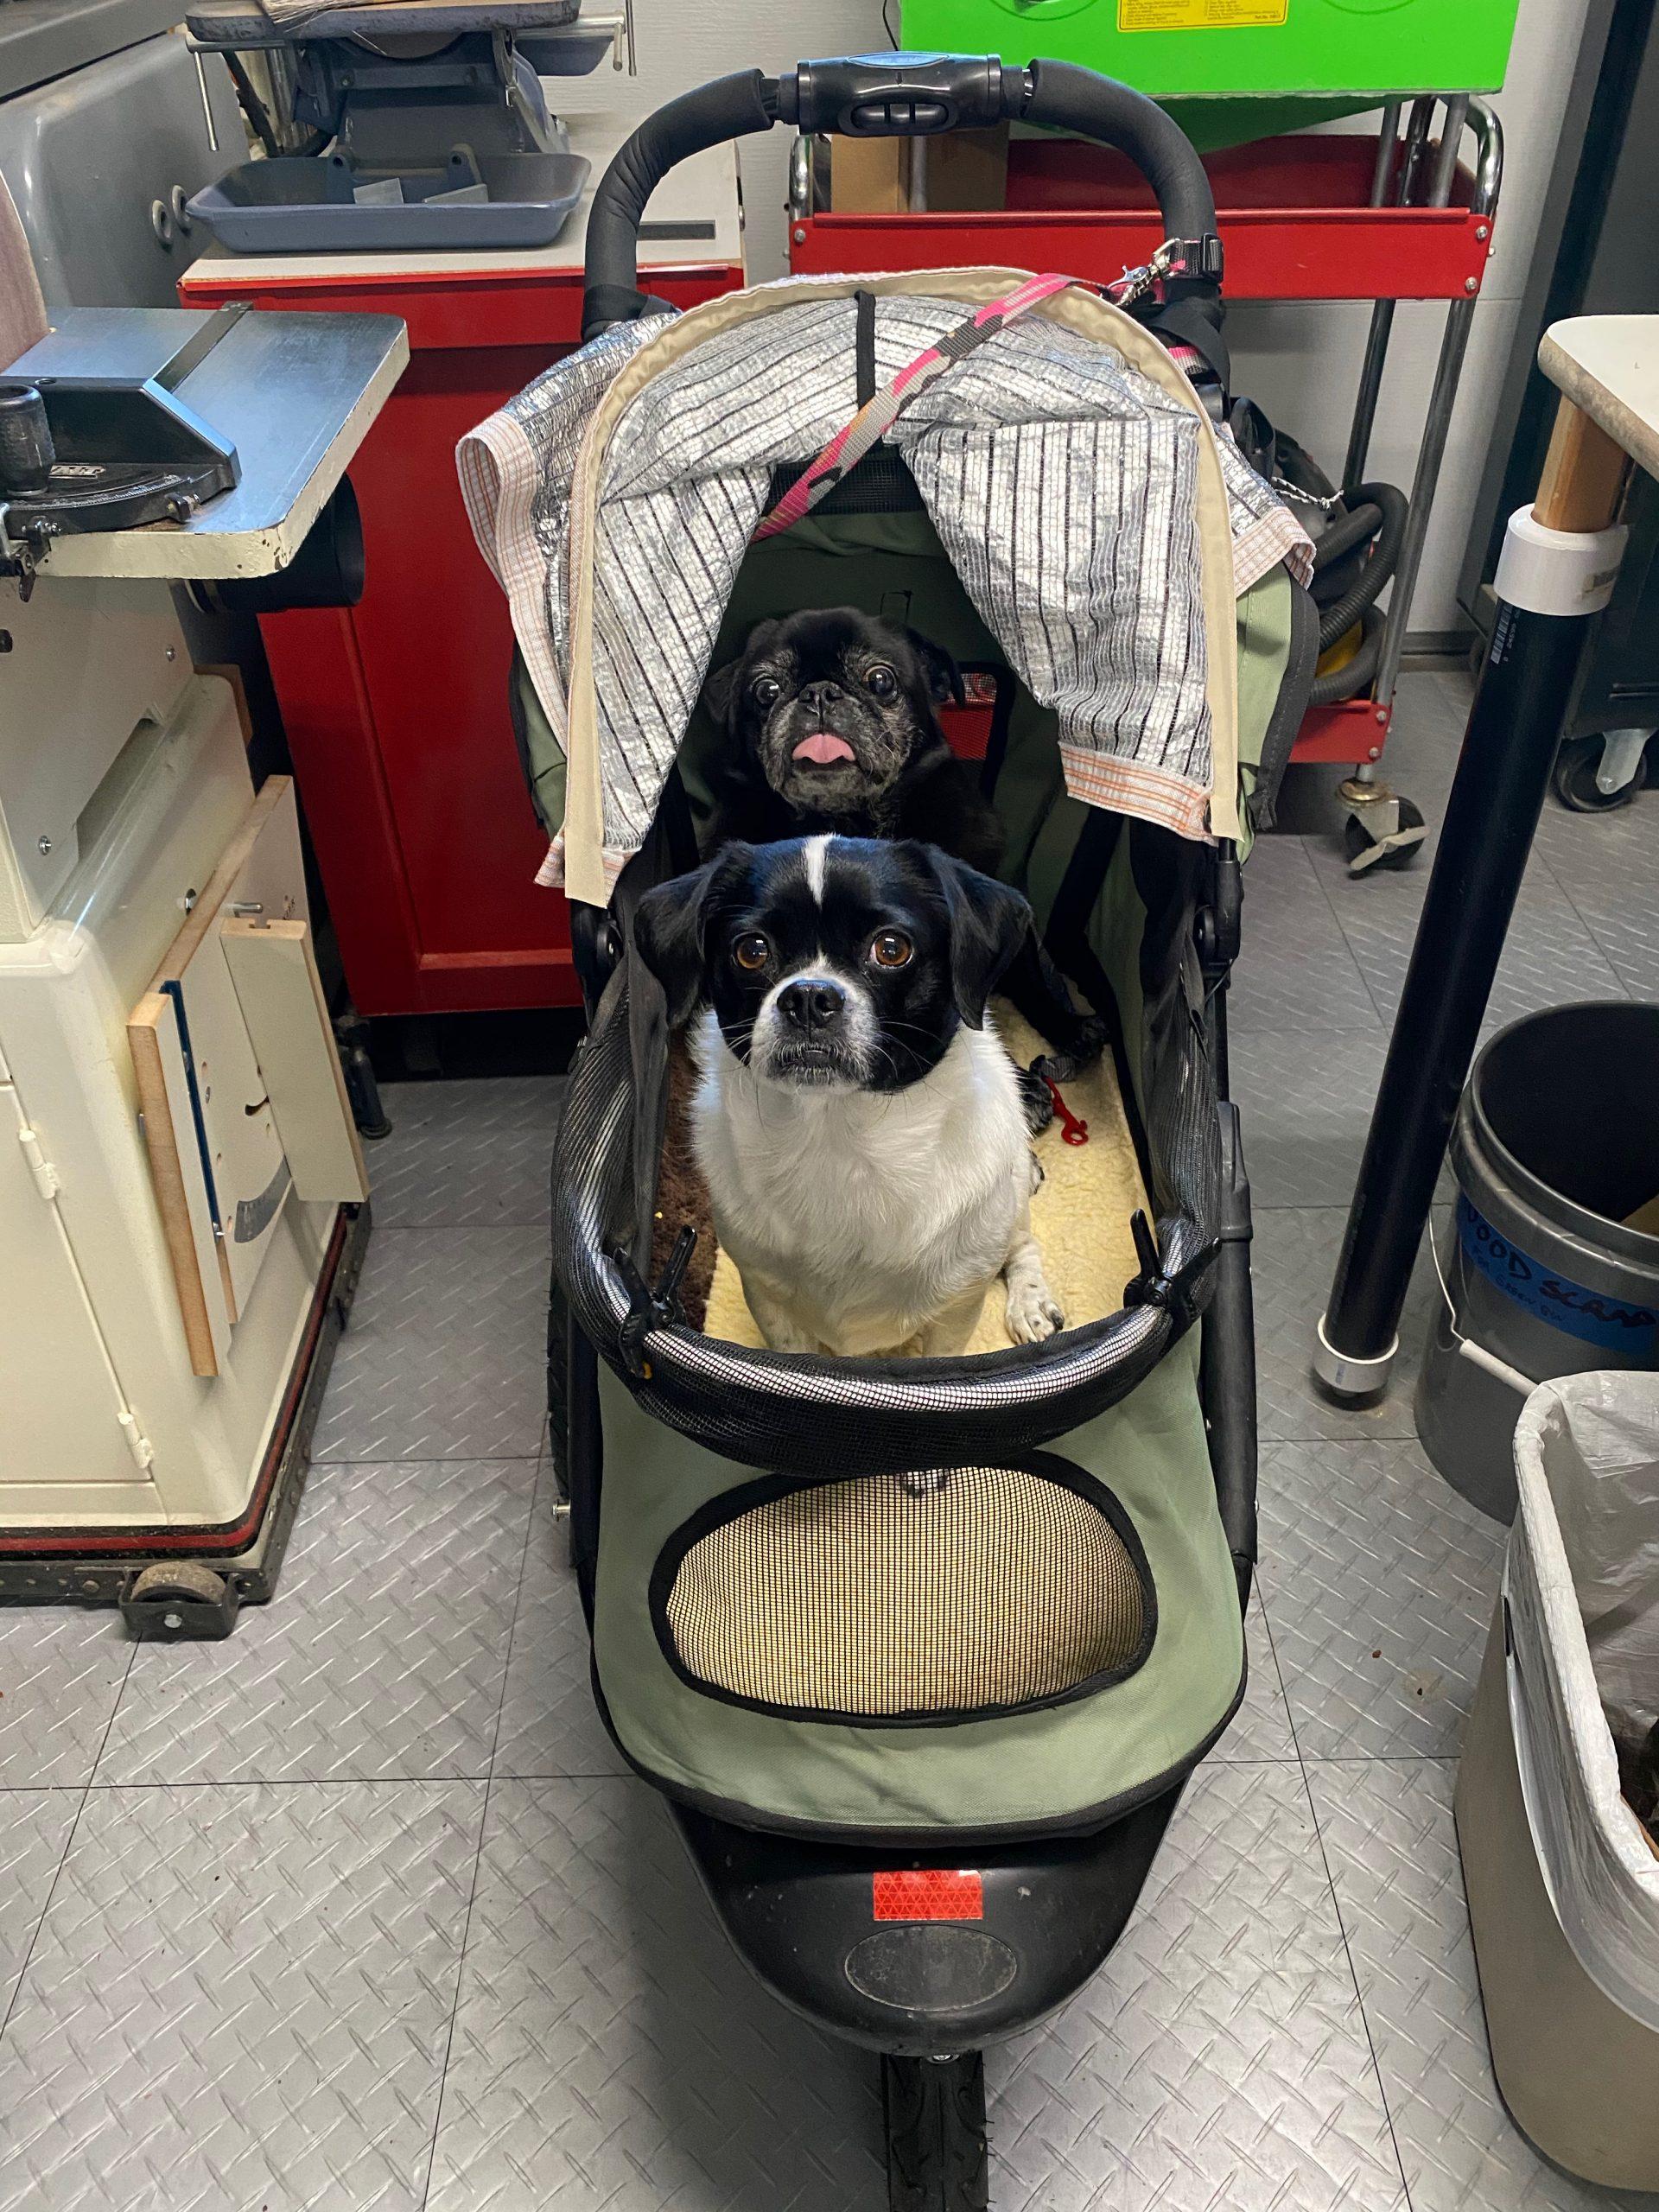 2-Pugs-in-Stroller-scaled.jpeg